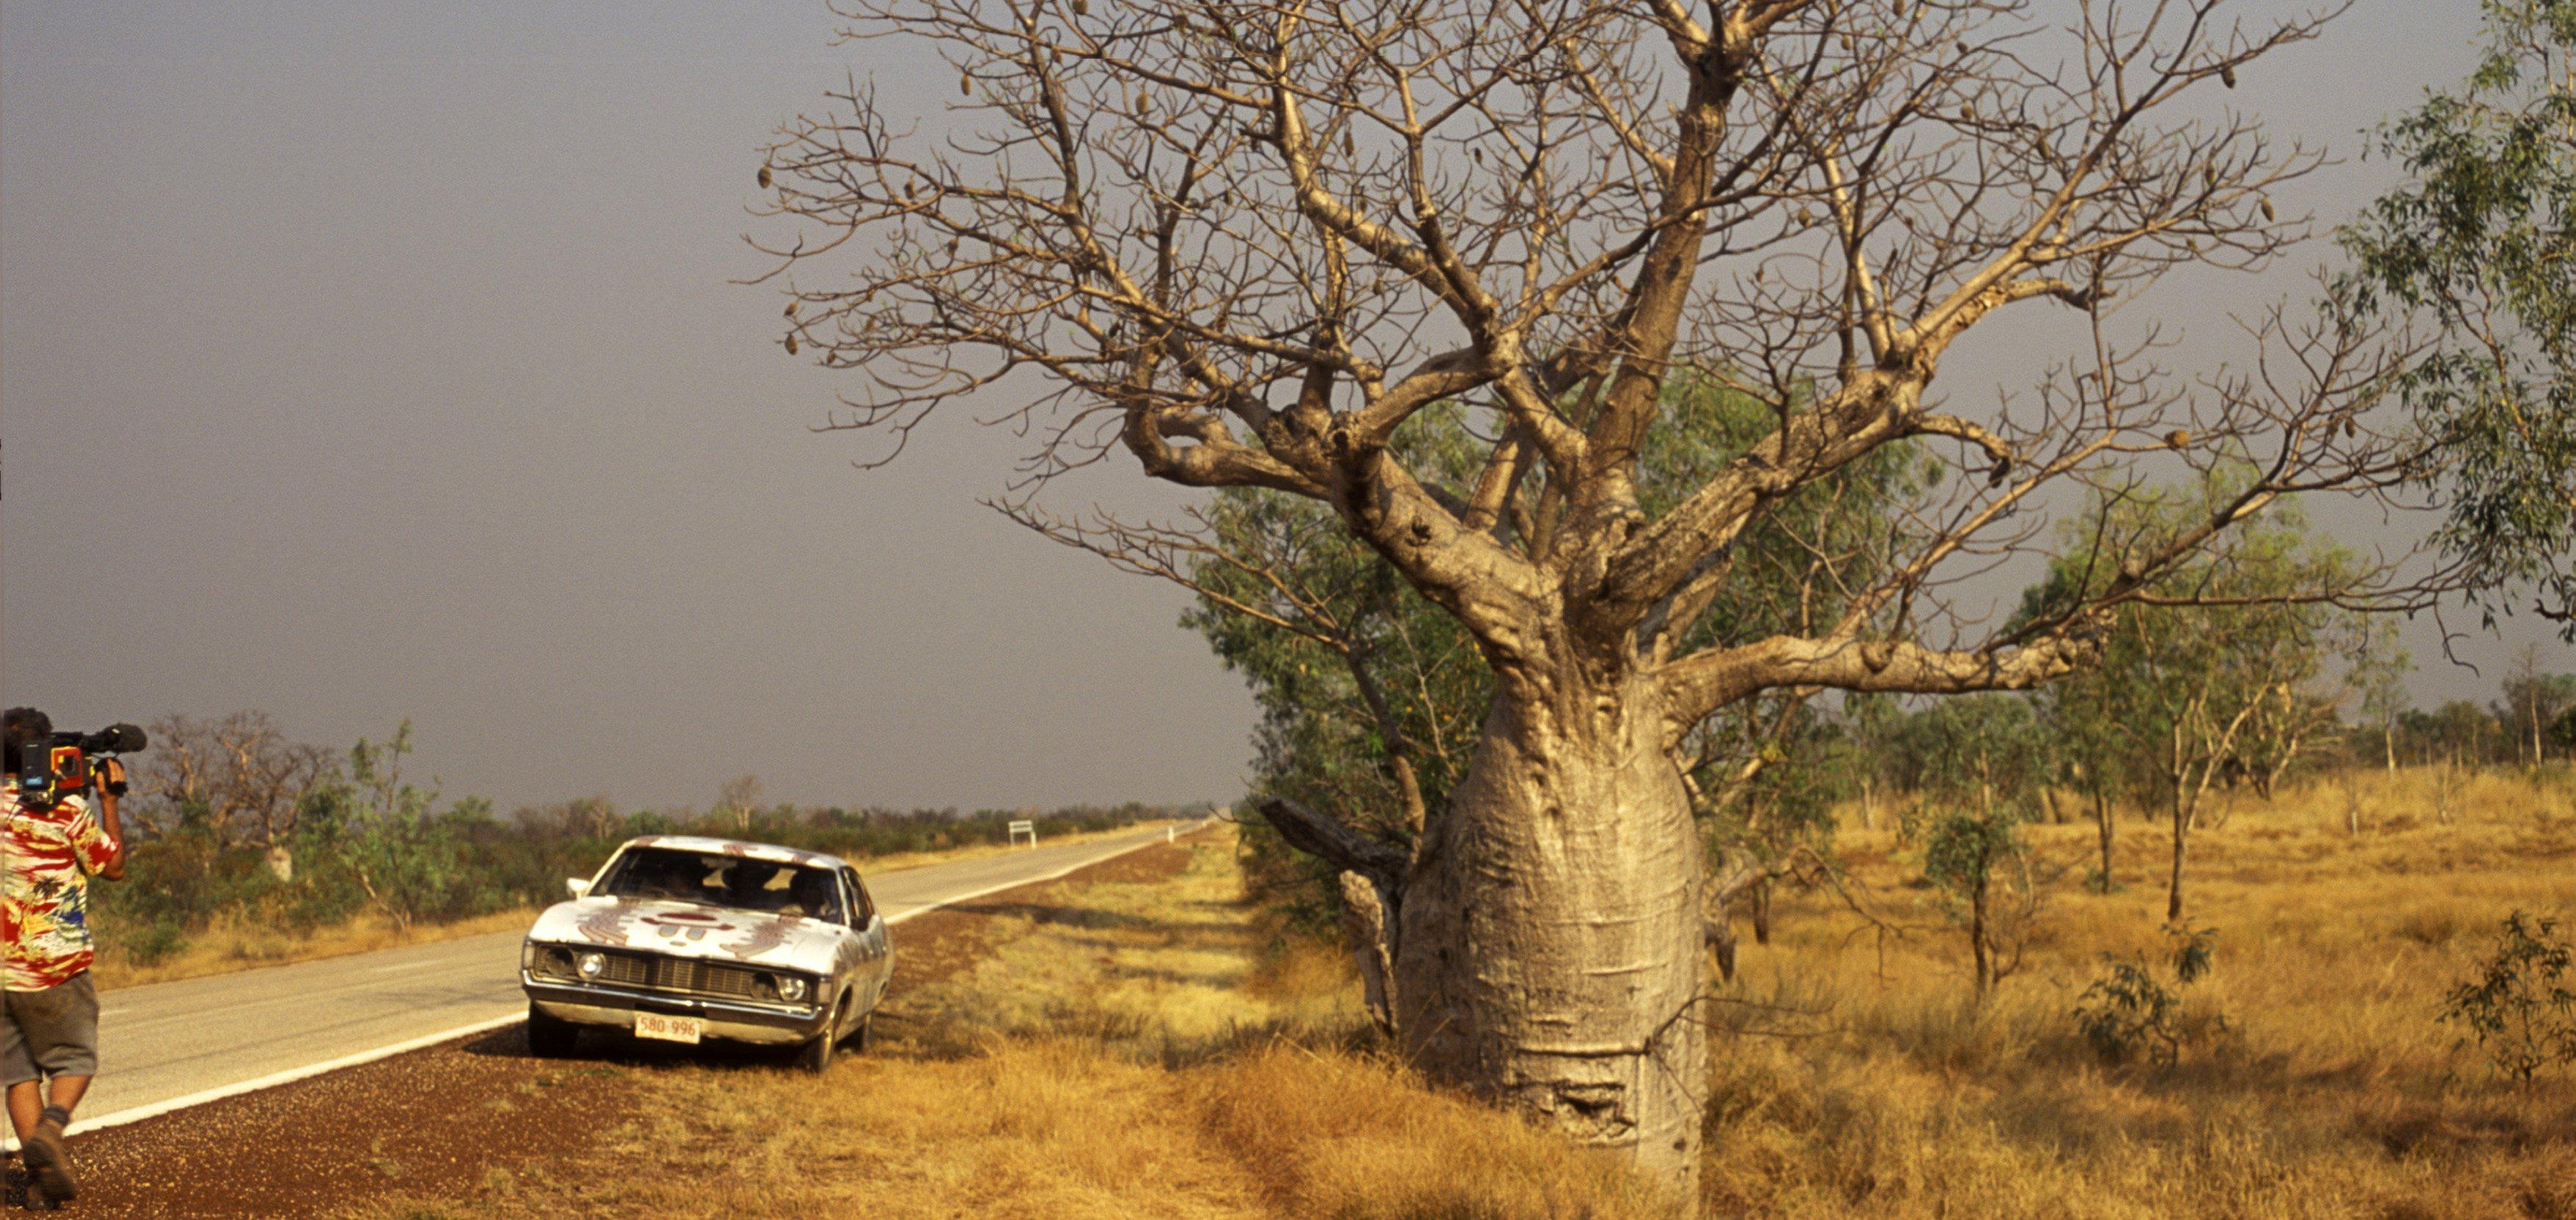 Filming Bush Mechanics on a track near a baobab tree - hero image